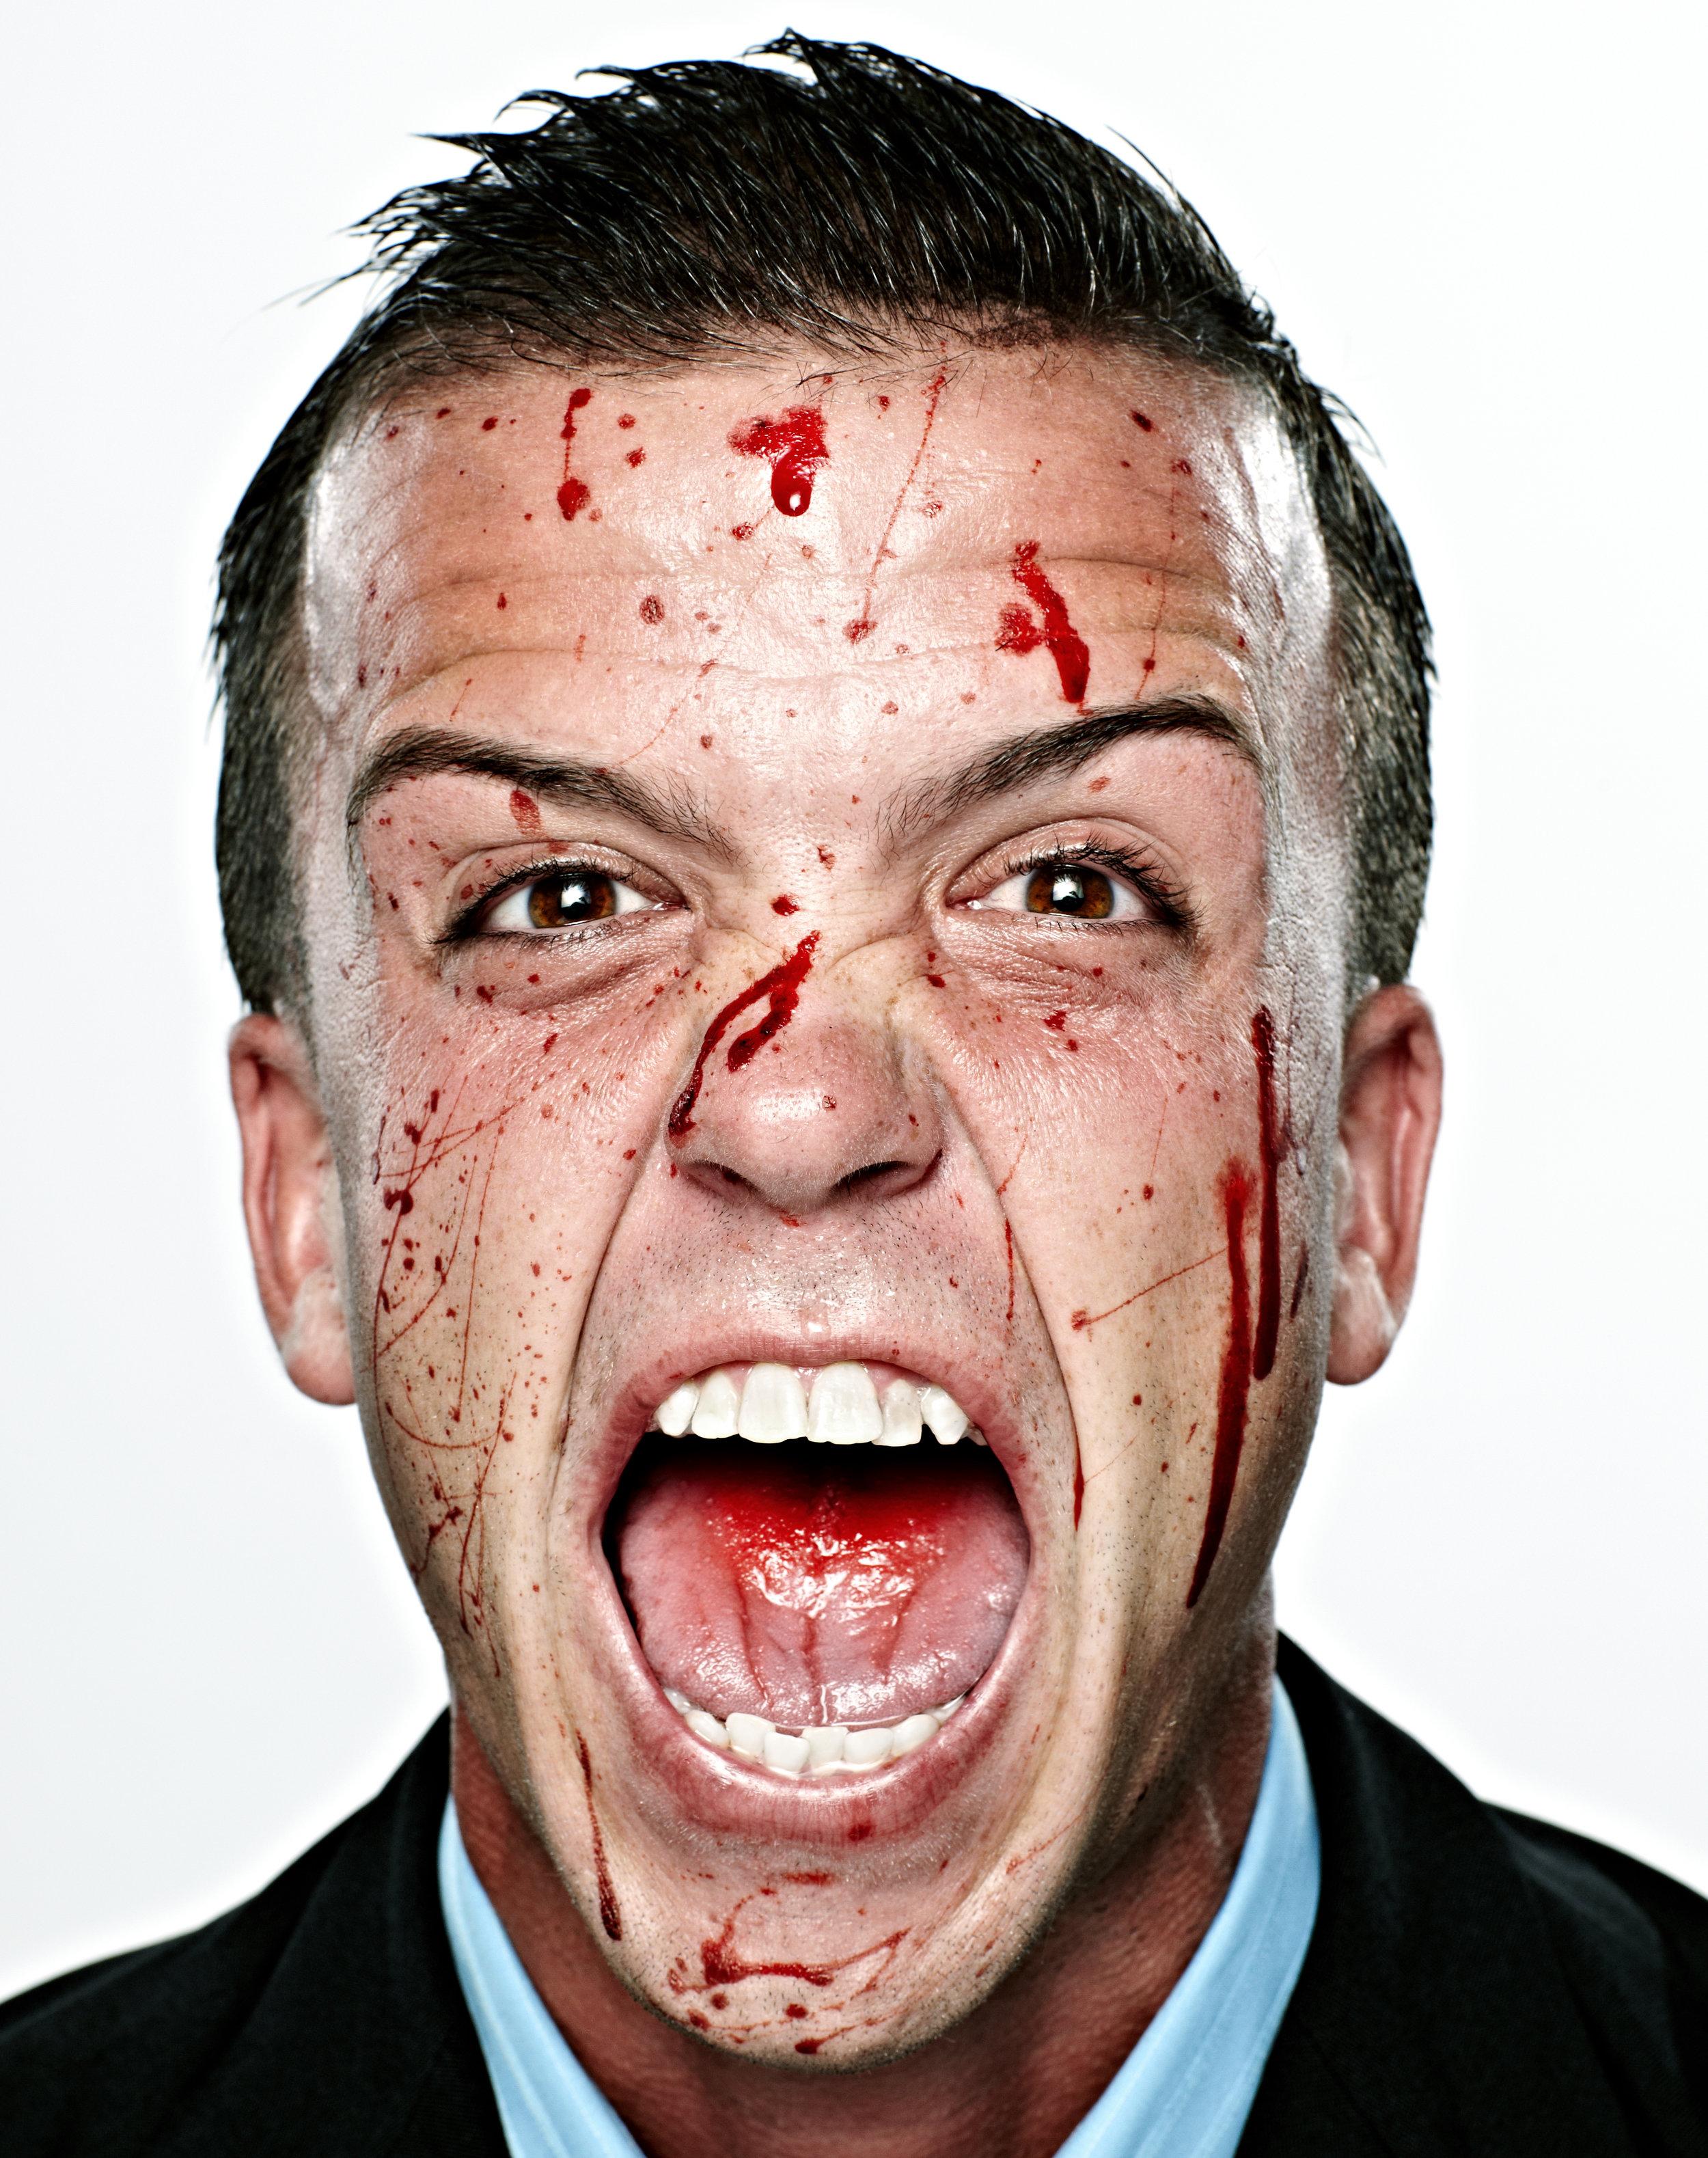 American Psycho_FINAL.jpg